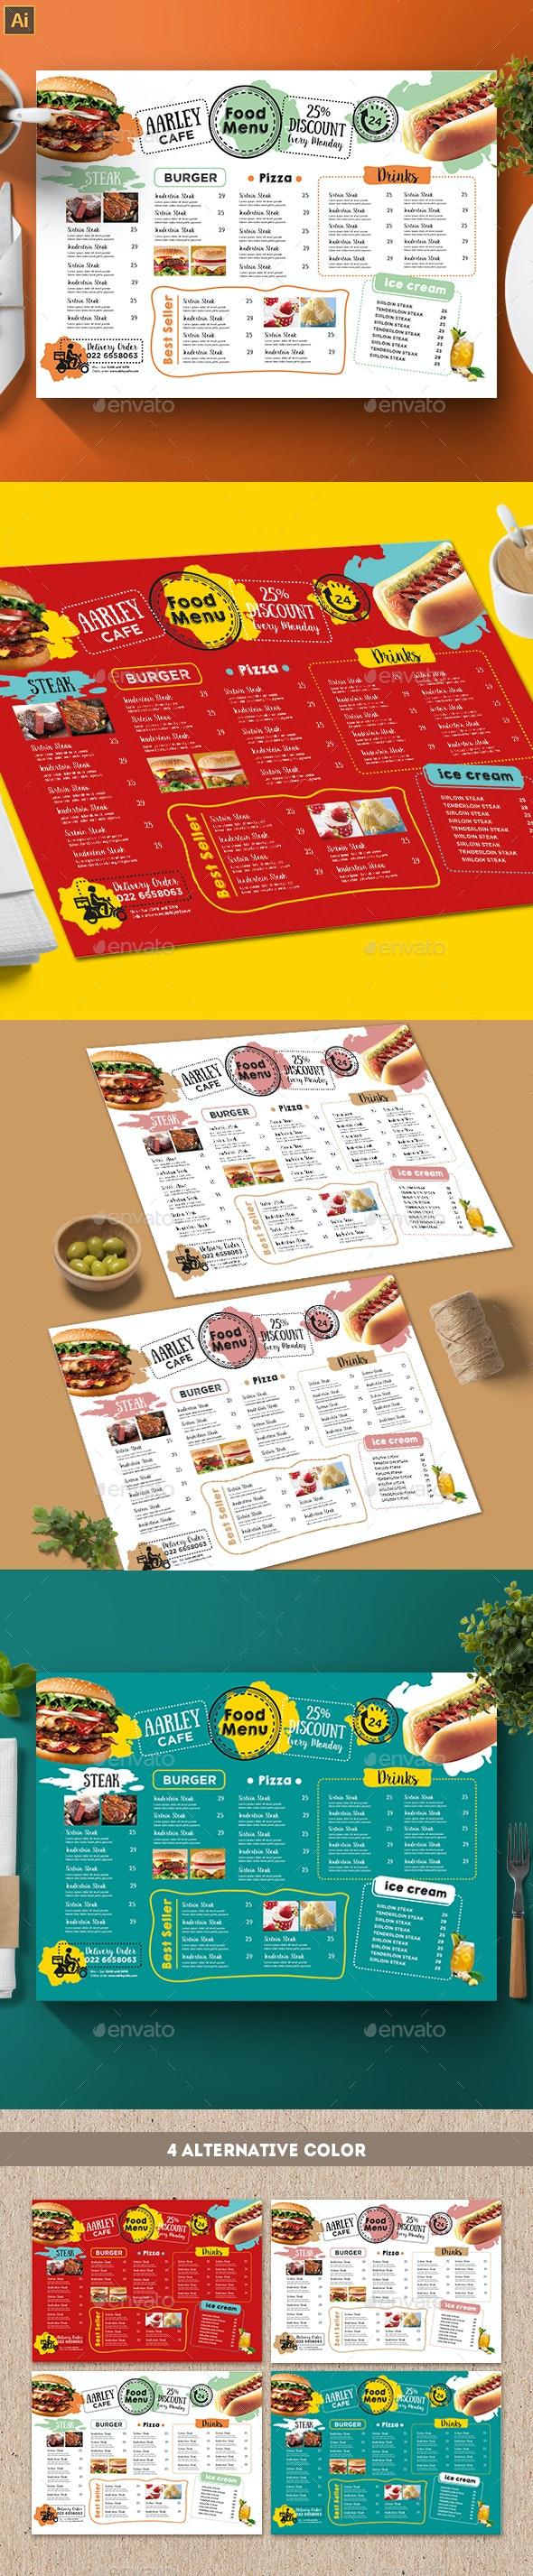 Cafe Menu Template - Food Menus Print Templates